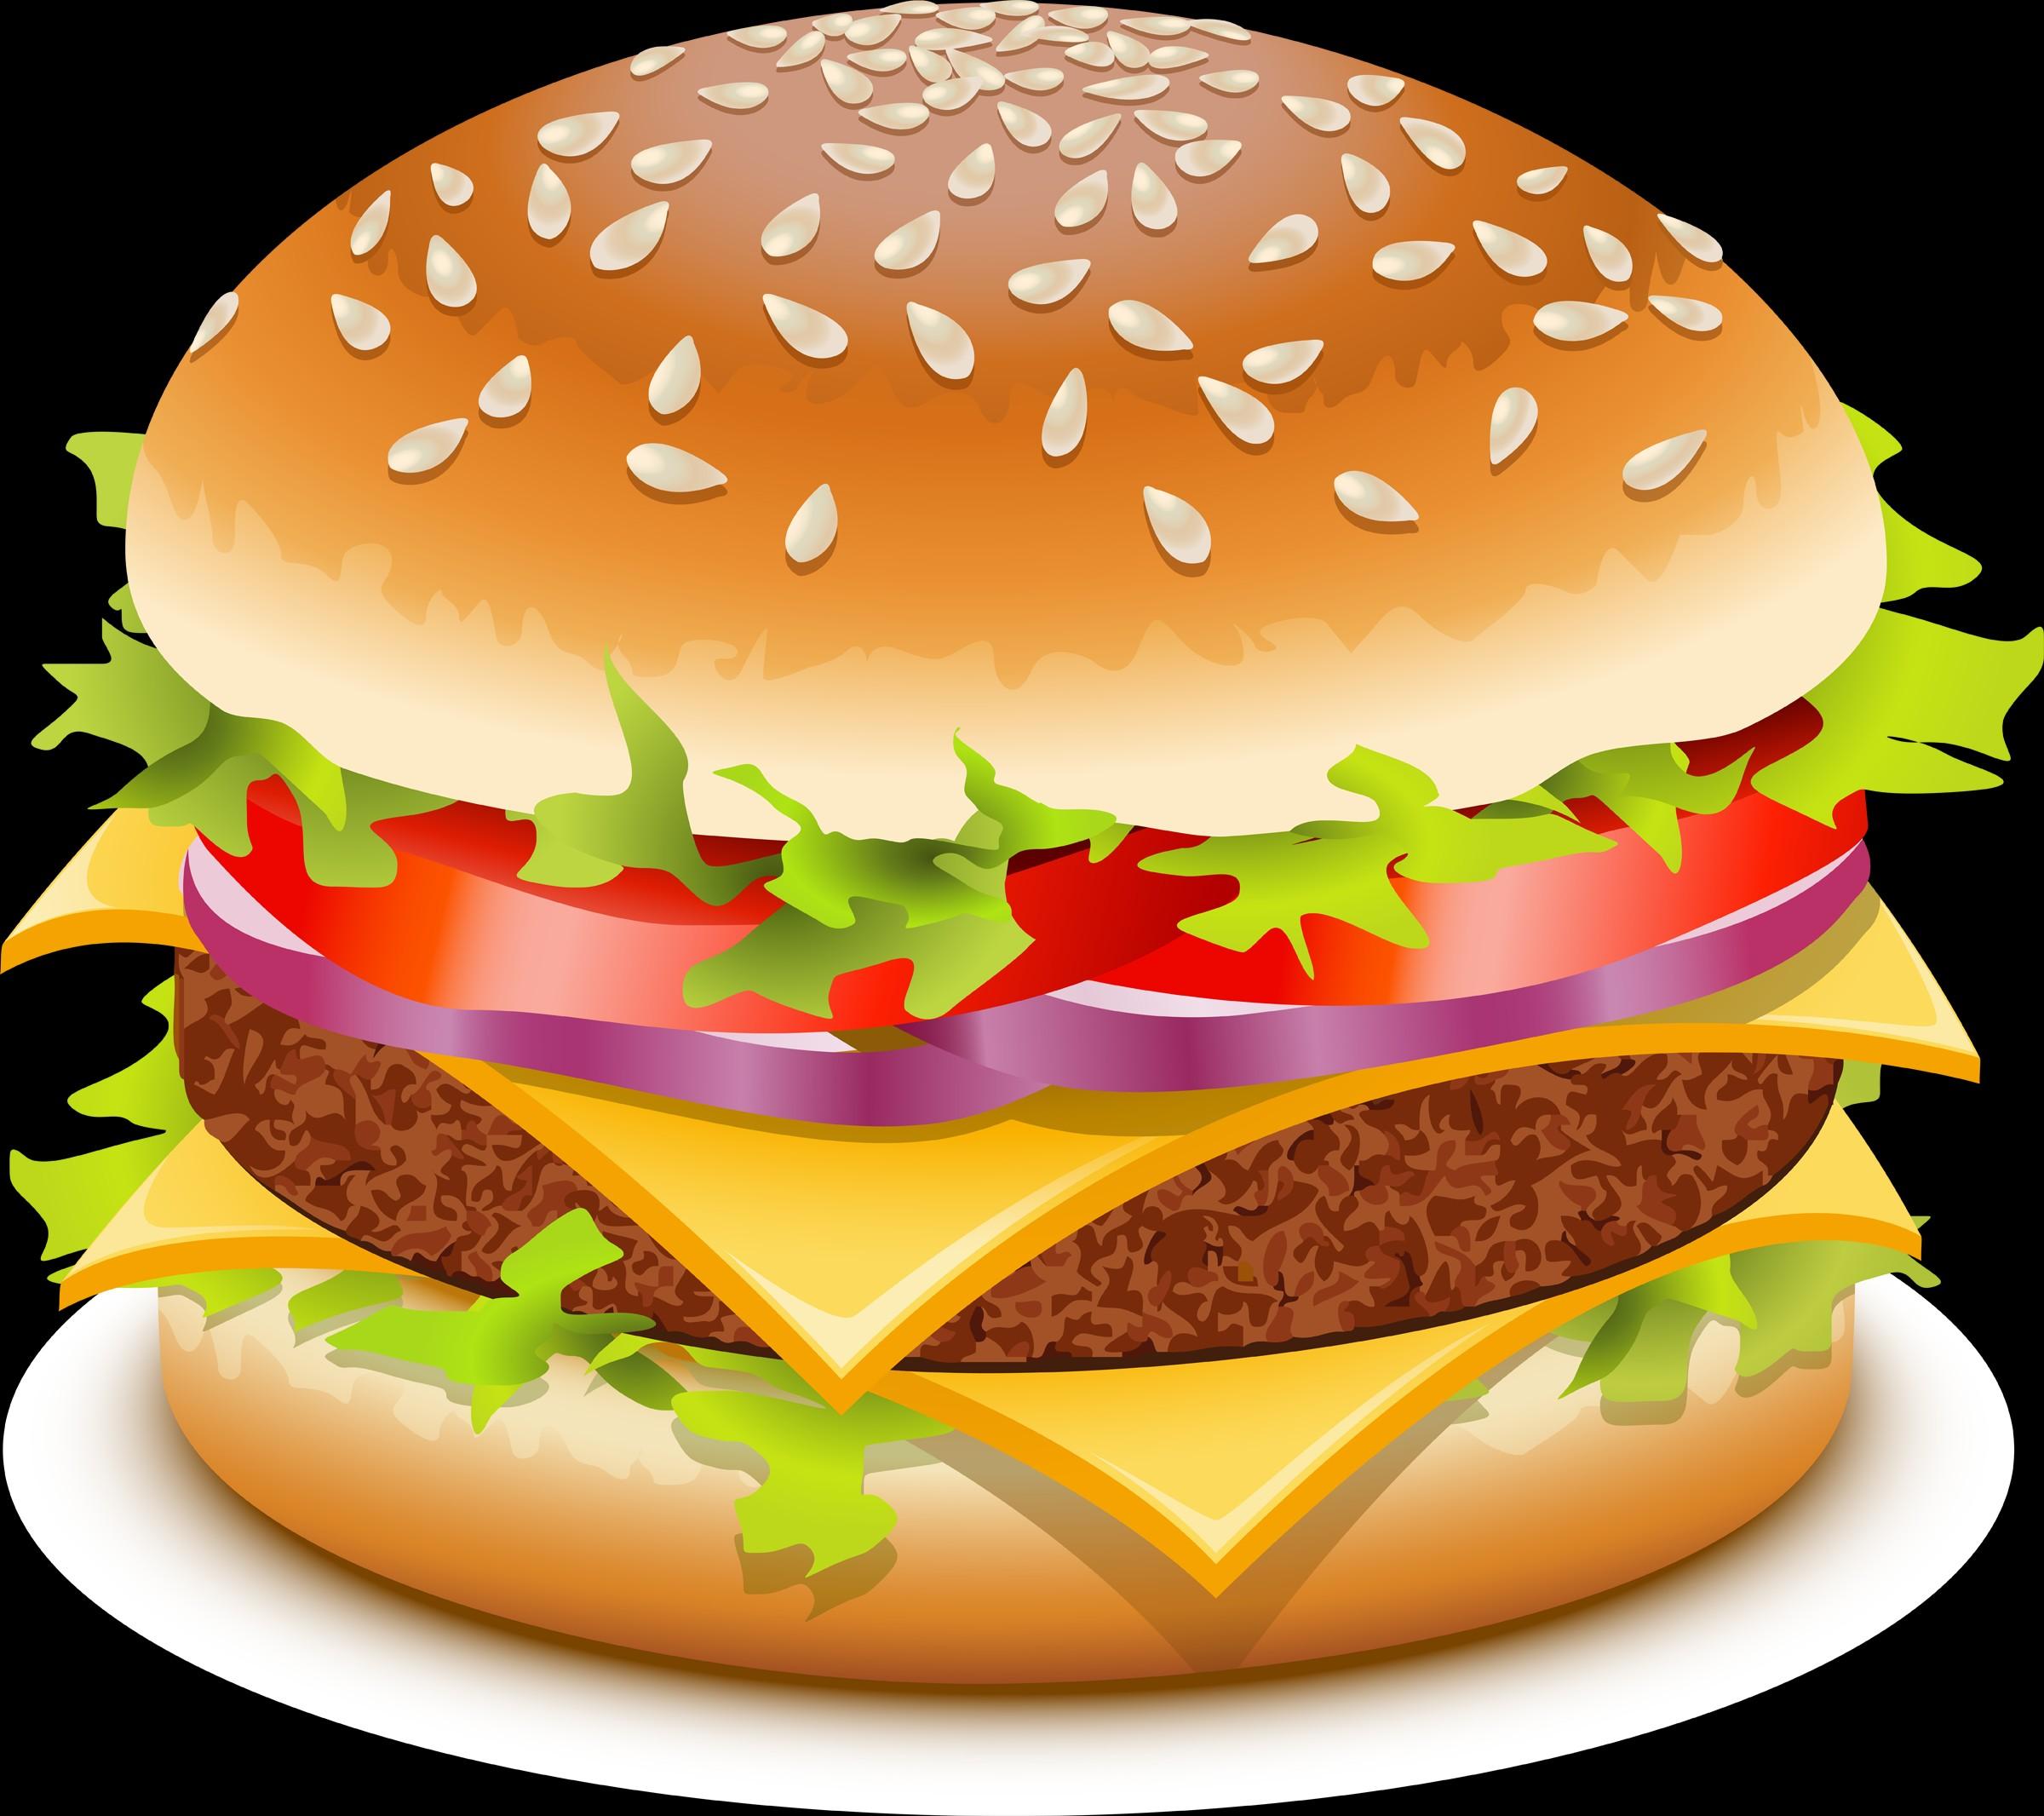 Burger clipart face. Hamburger cartoon image clip